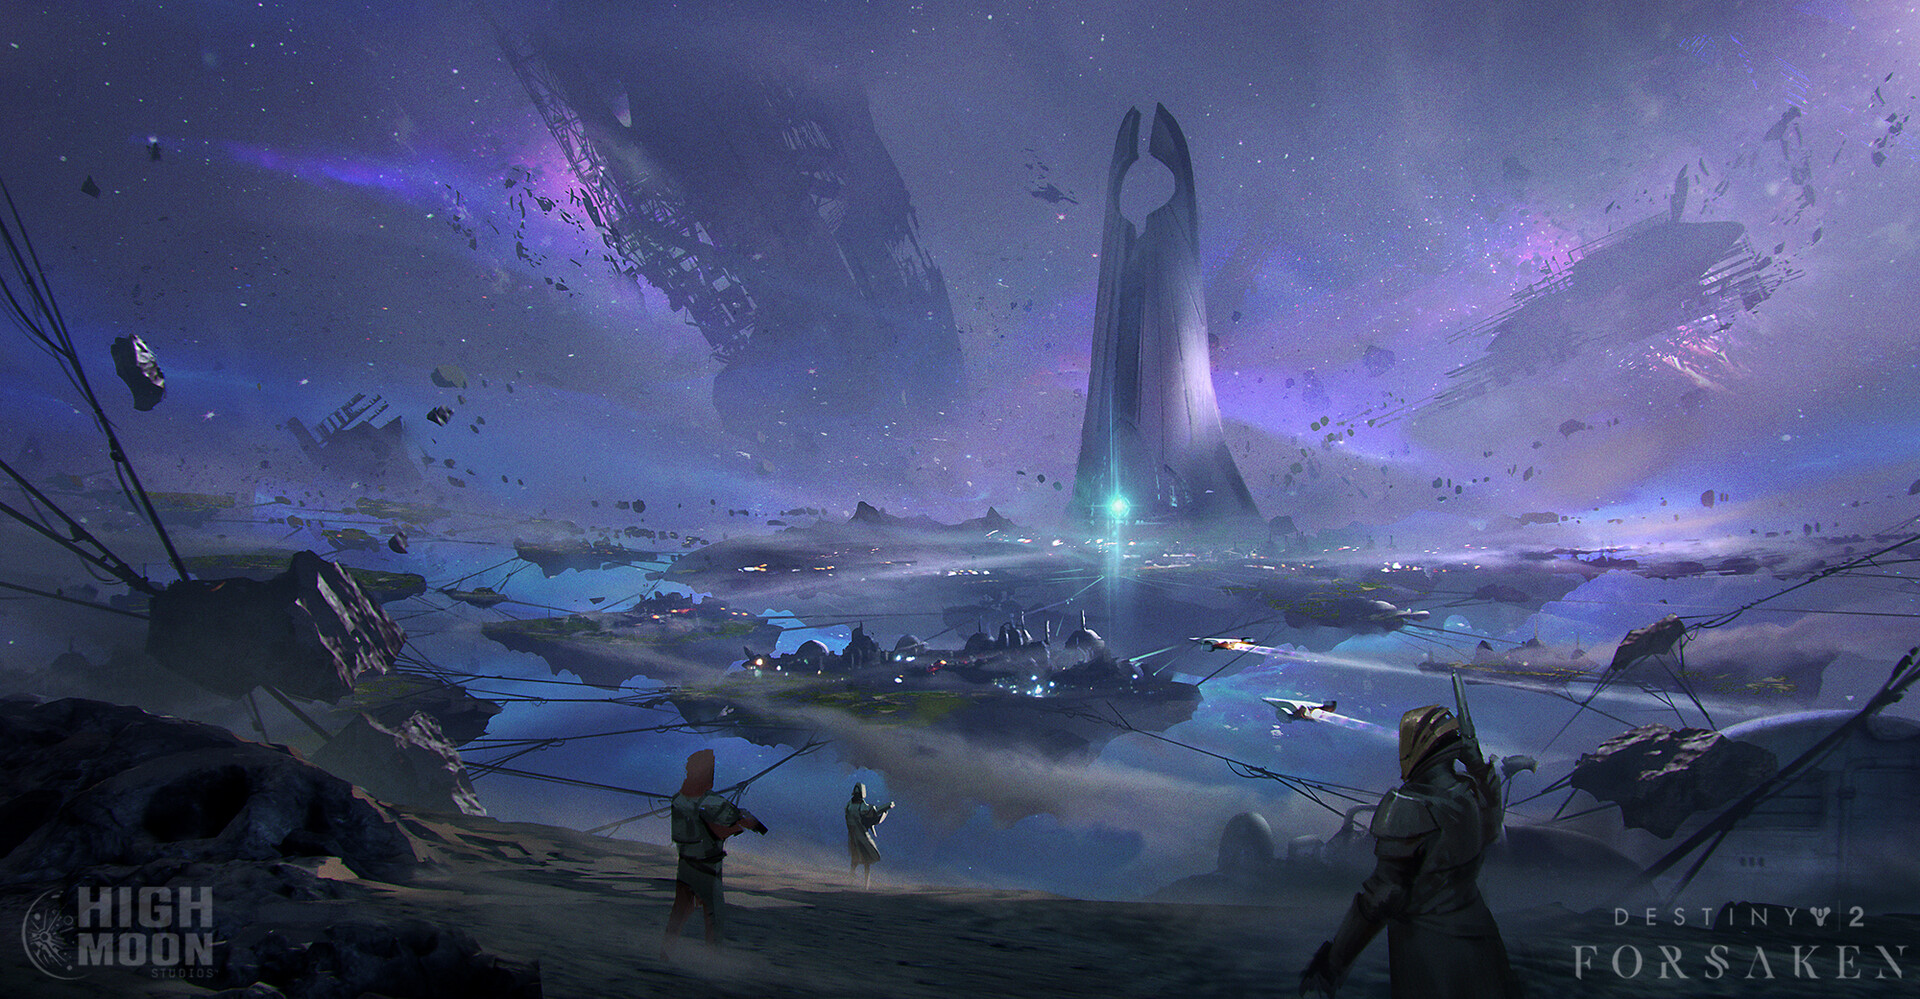 Destiny 2 The Tangled Shore